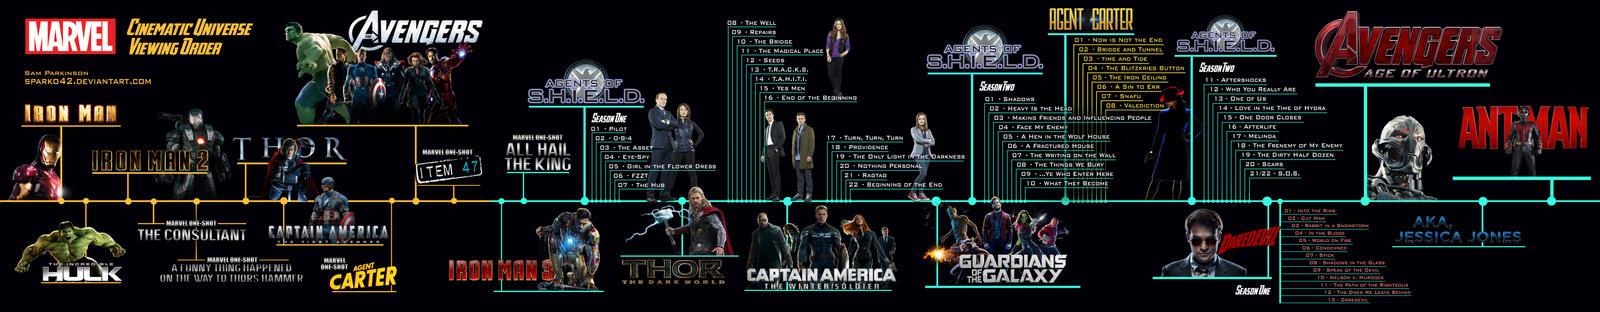 Marvel Cinematic Universe - Marathon Timeline